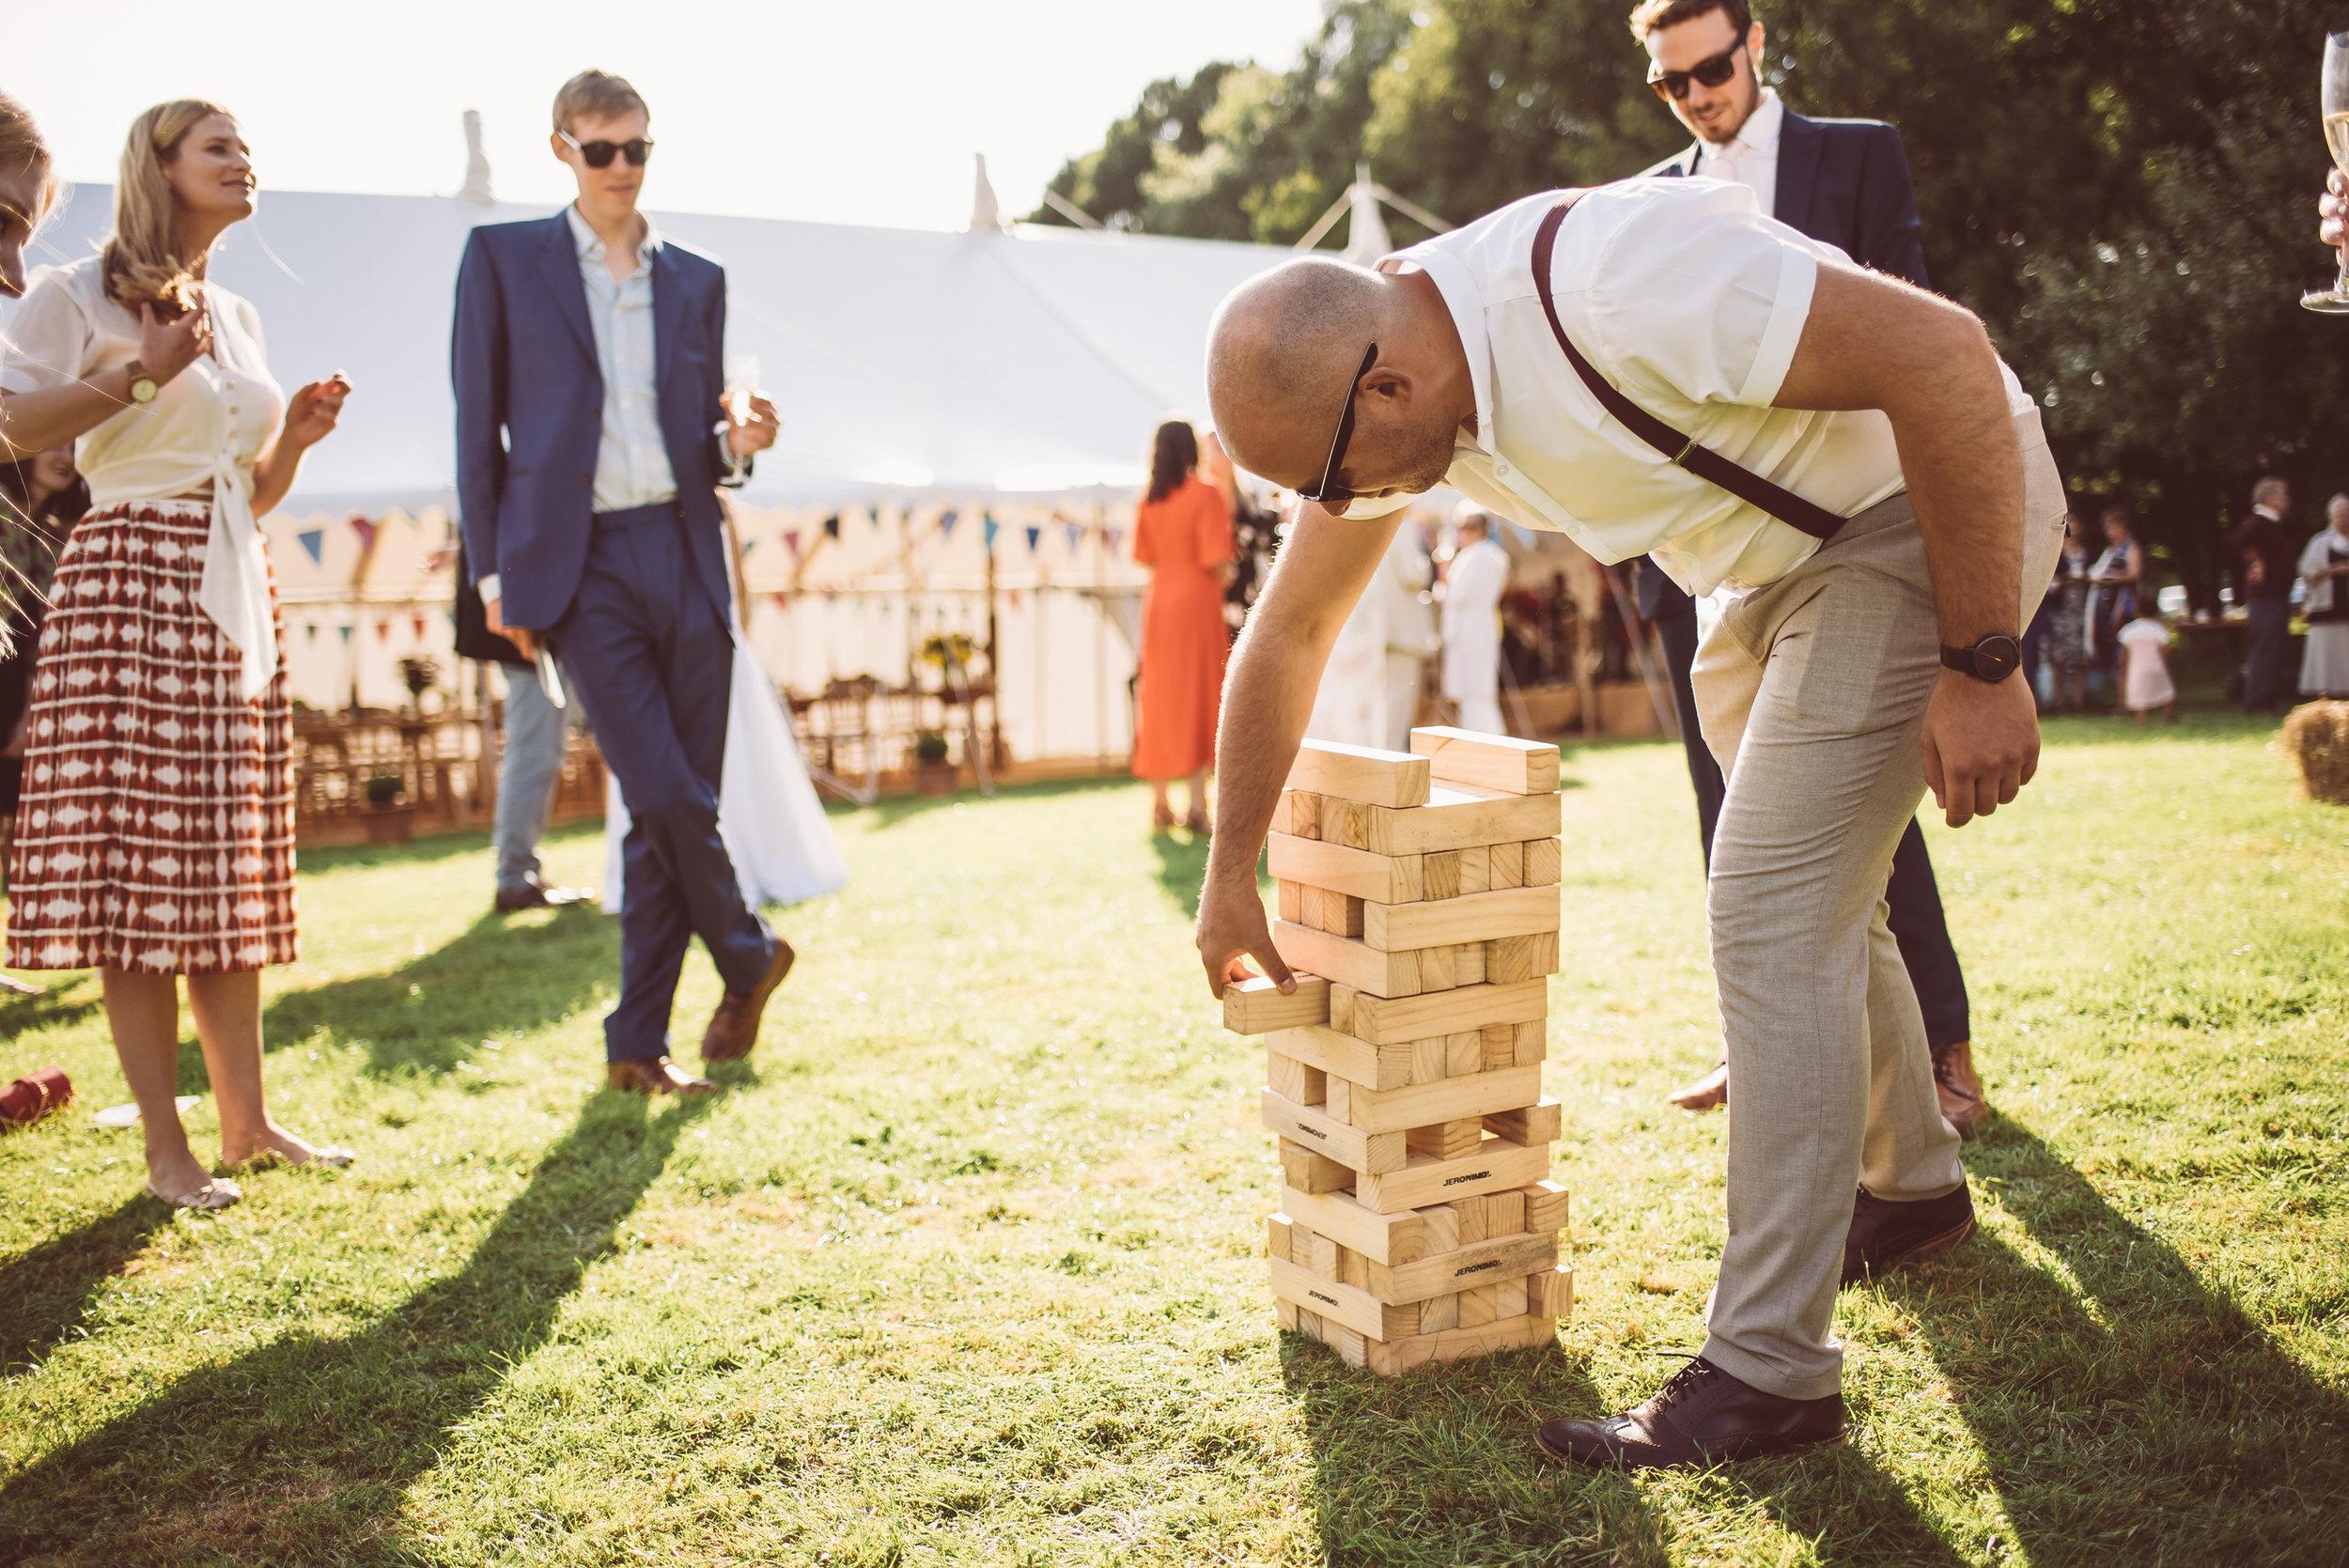 knepp-castle-boho-outdoor-wedding-387.jpg